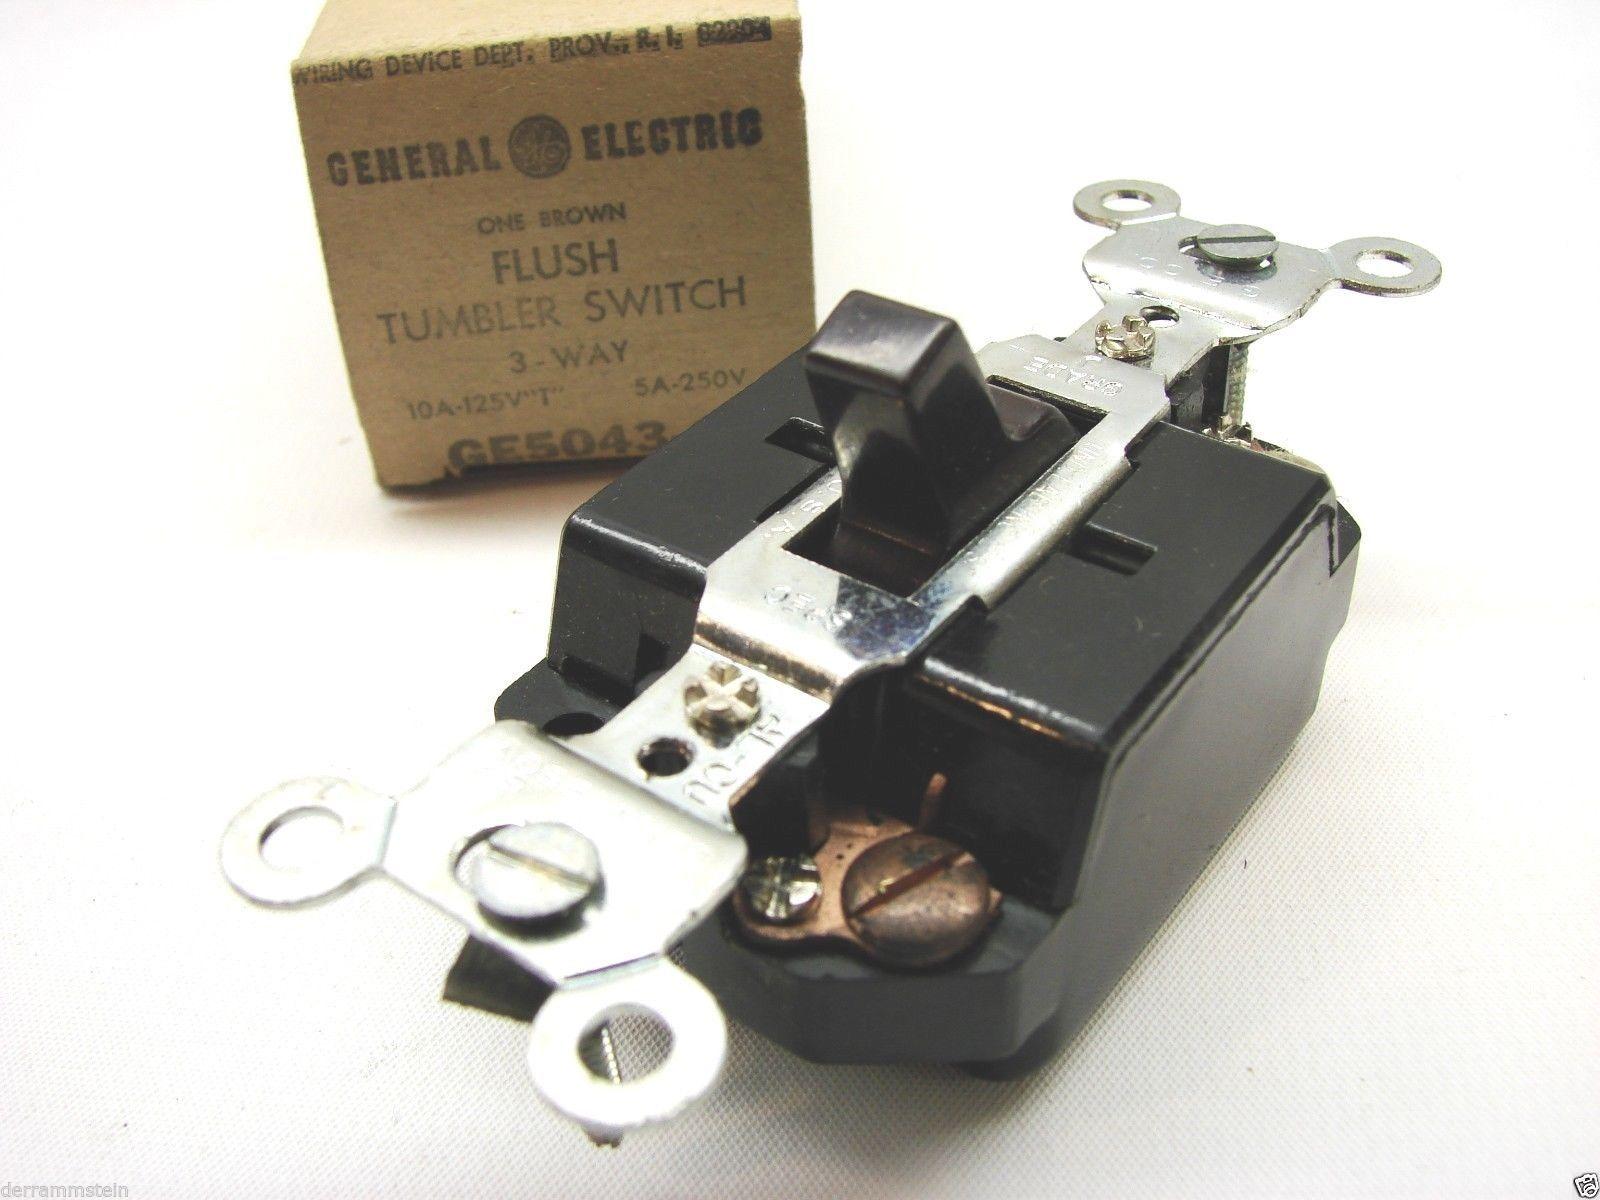 3 way electric 1999 bmw z3 alarm wiring diagrams general ge5043 1 125v 10a brown tumbler